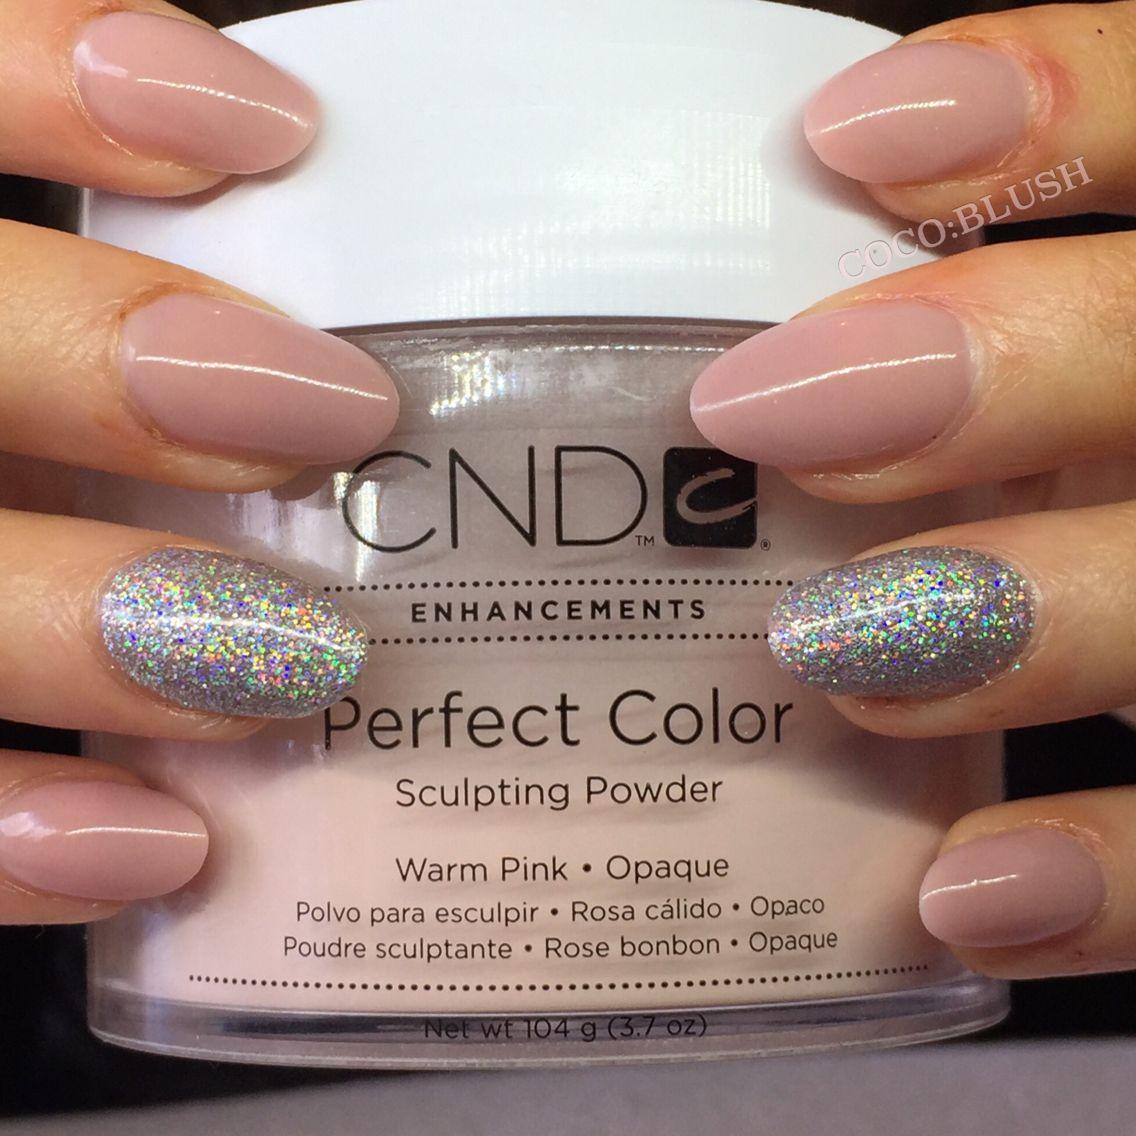 Acrylic Nails Nude Sculpted Cnd Lecenté Glitter